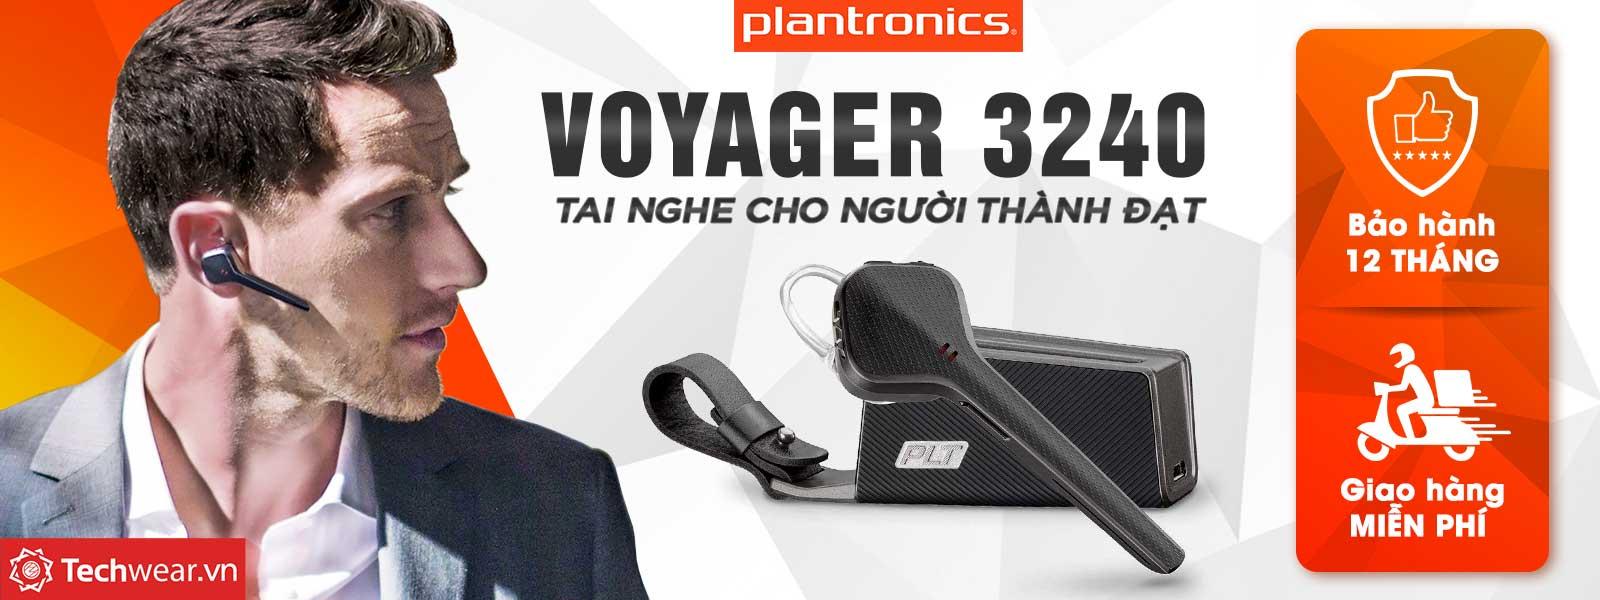 Plantronics Voyager 3240